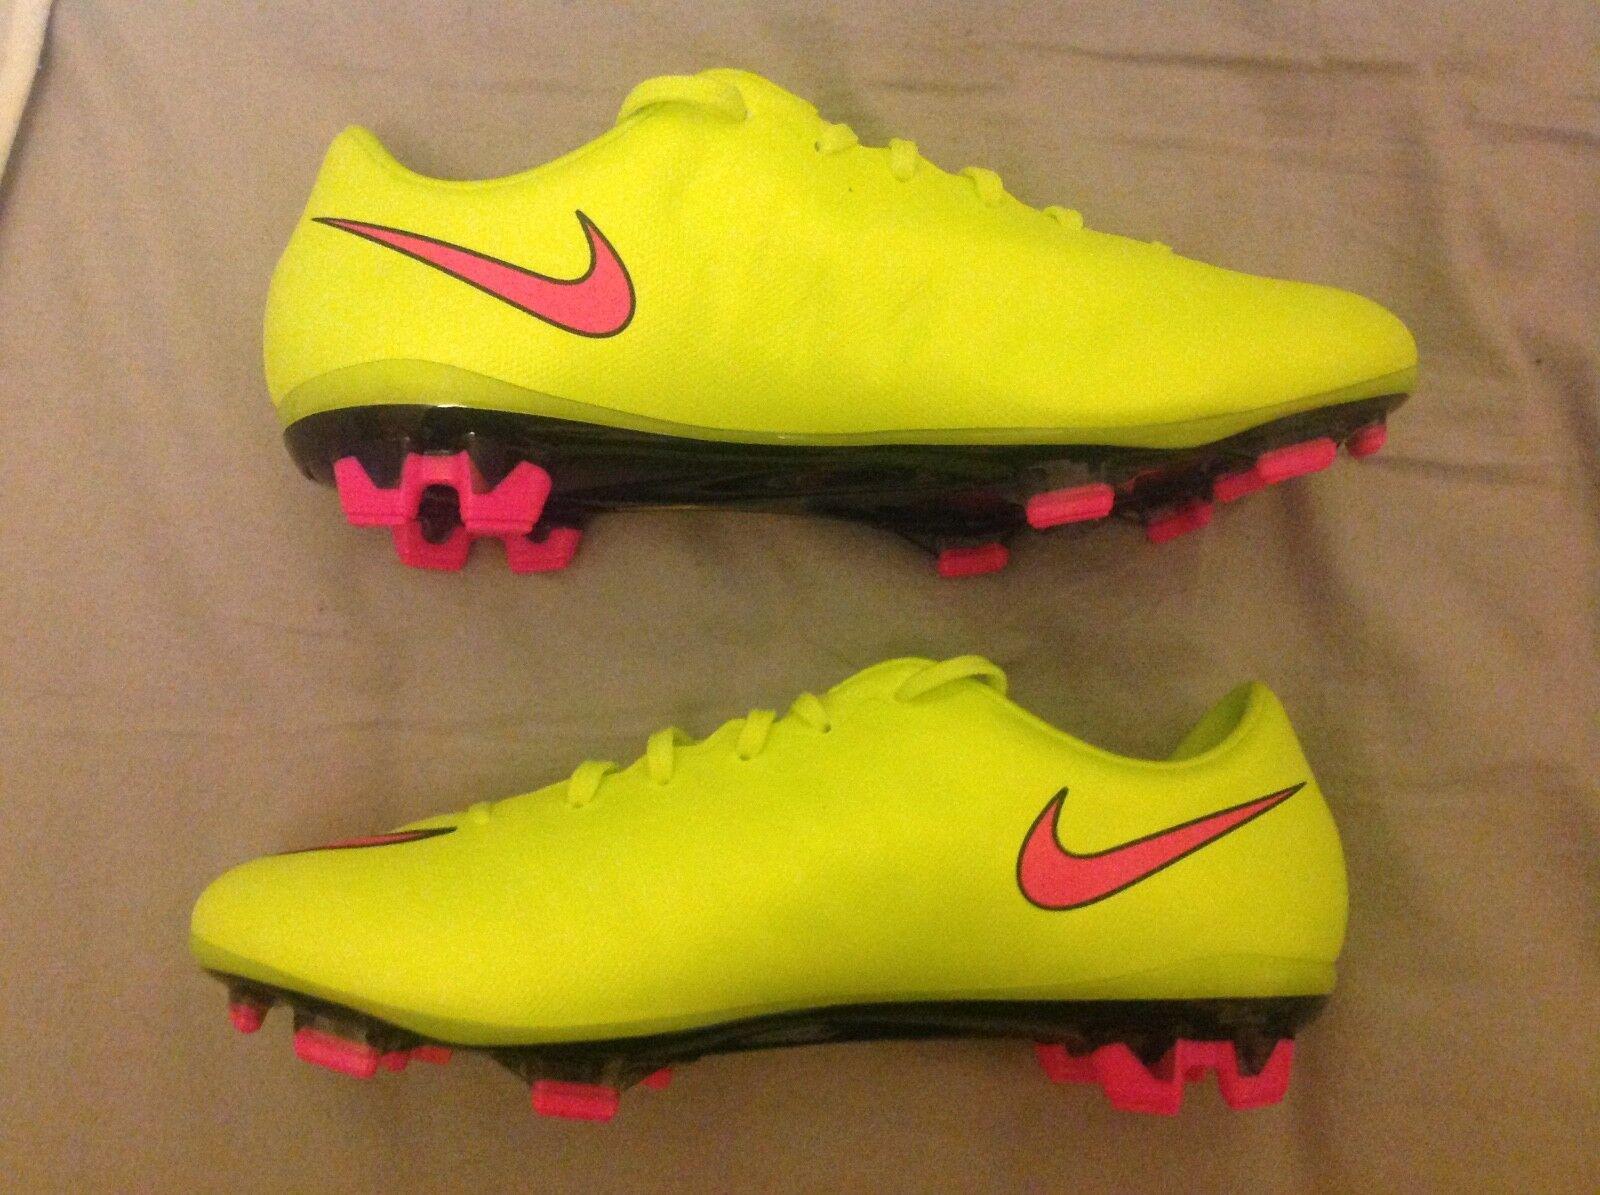 NIKE MERCURIAL FG FOOTBALL Stiefel UK 6 EUR 39 US US US 6.5 VOLT Gelb VAPOR SUPERFLY b529c0